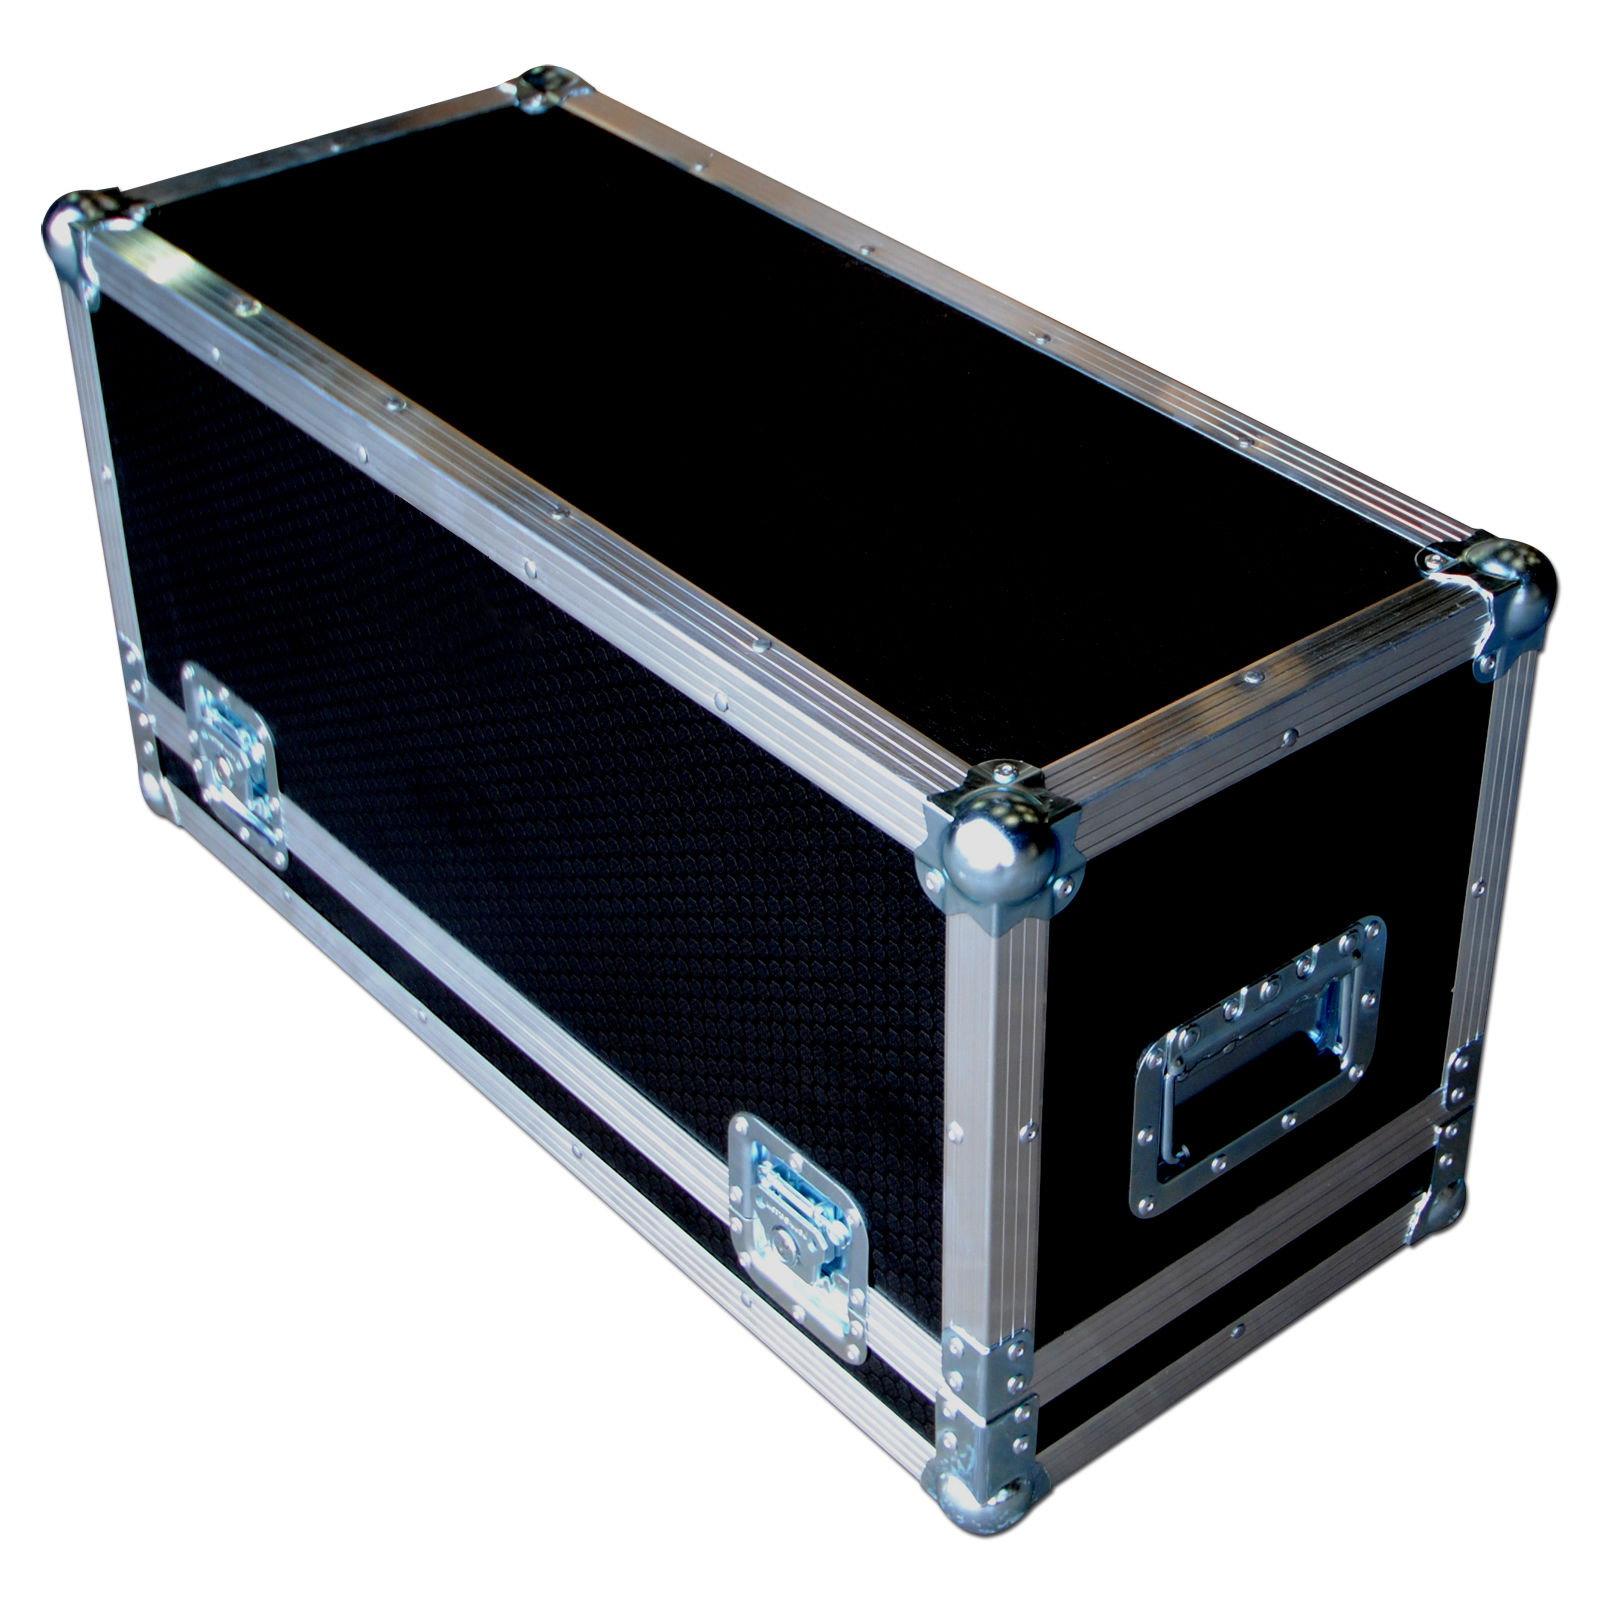 martin magnum 2000 smoke machine flight case. Black Bedroom Furniture Sets. Home Design Ideas